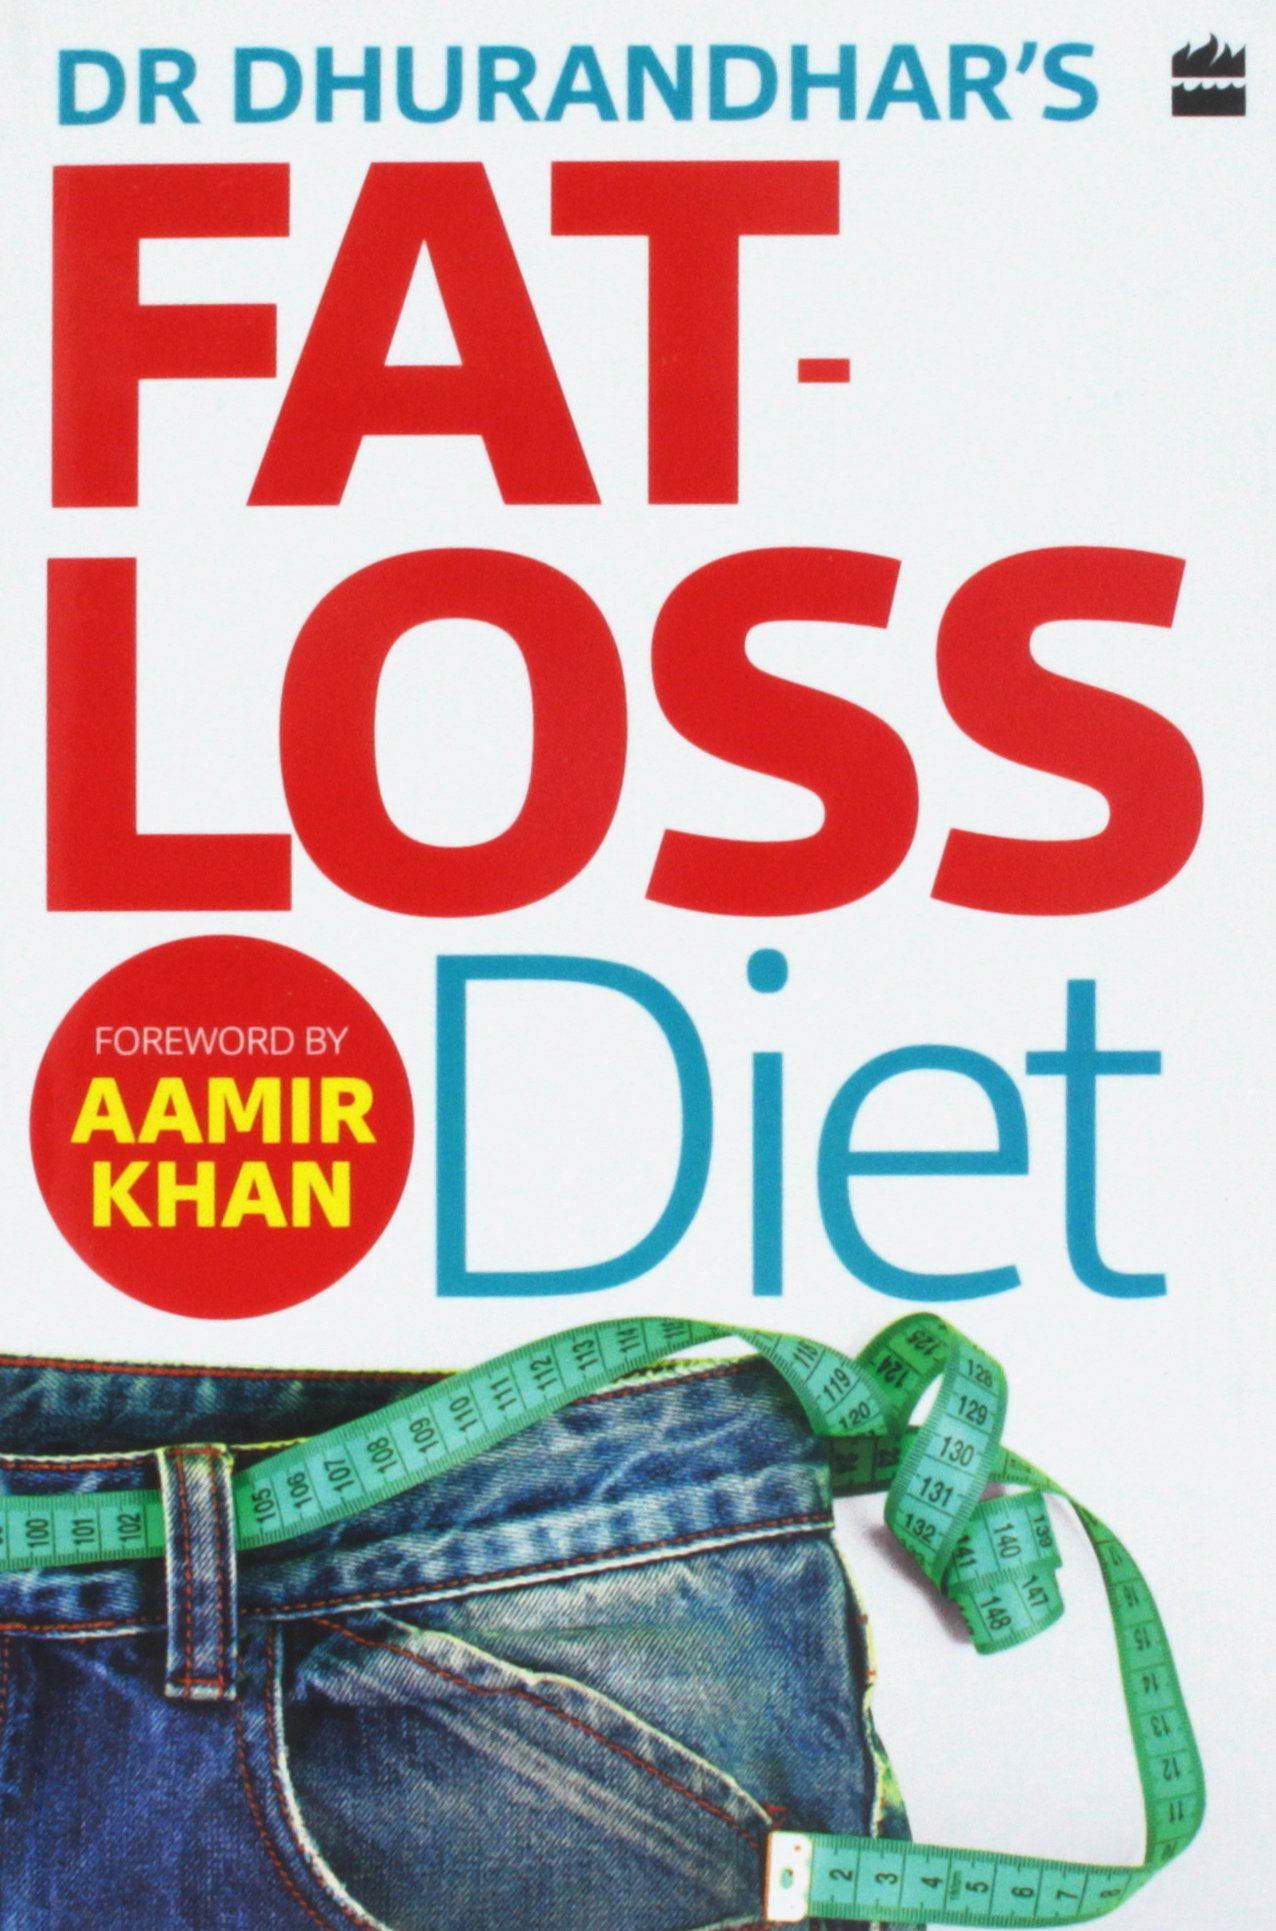 Dr Dhurandhar's Fat-loss Diet: Dr. Nikhil Dhurandhar: 9789352770304:  Amazon.com: Books